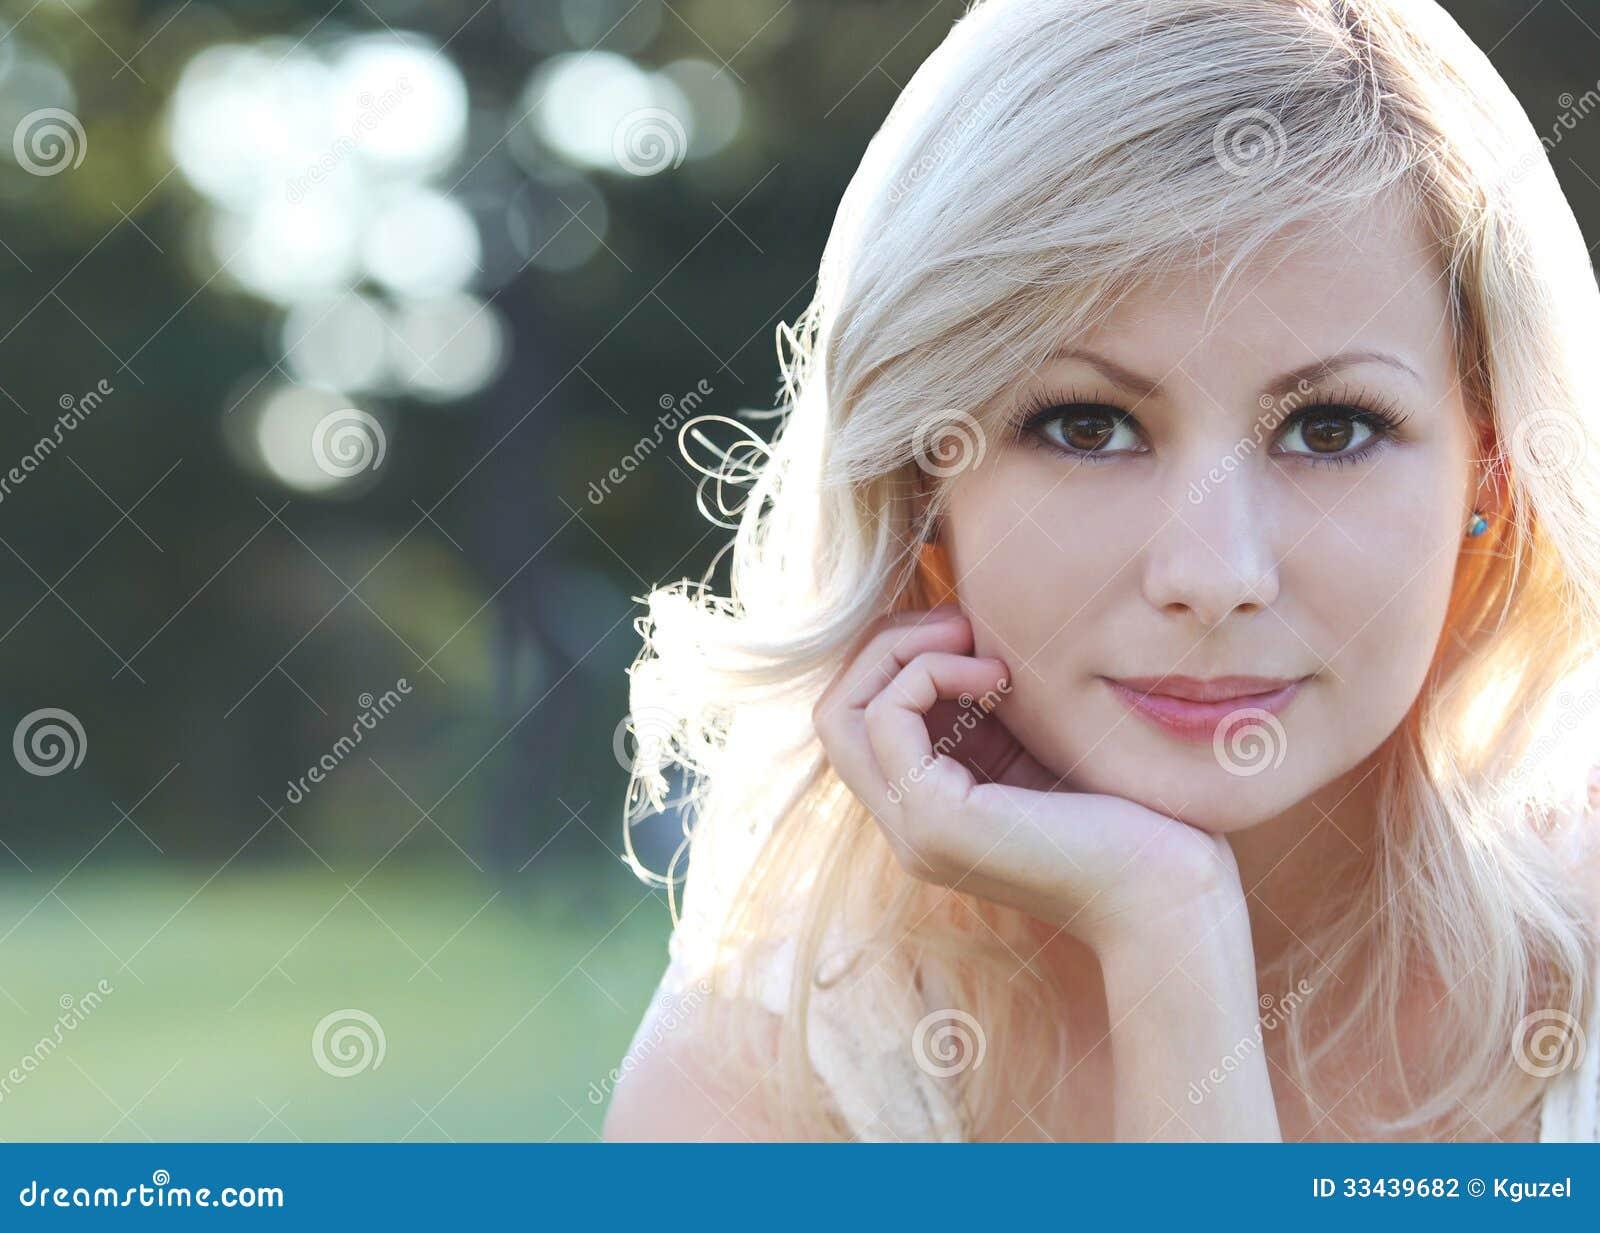 Smiling blonde girl. Portrait of happy beautiful young woman, outdoors. Bokeh